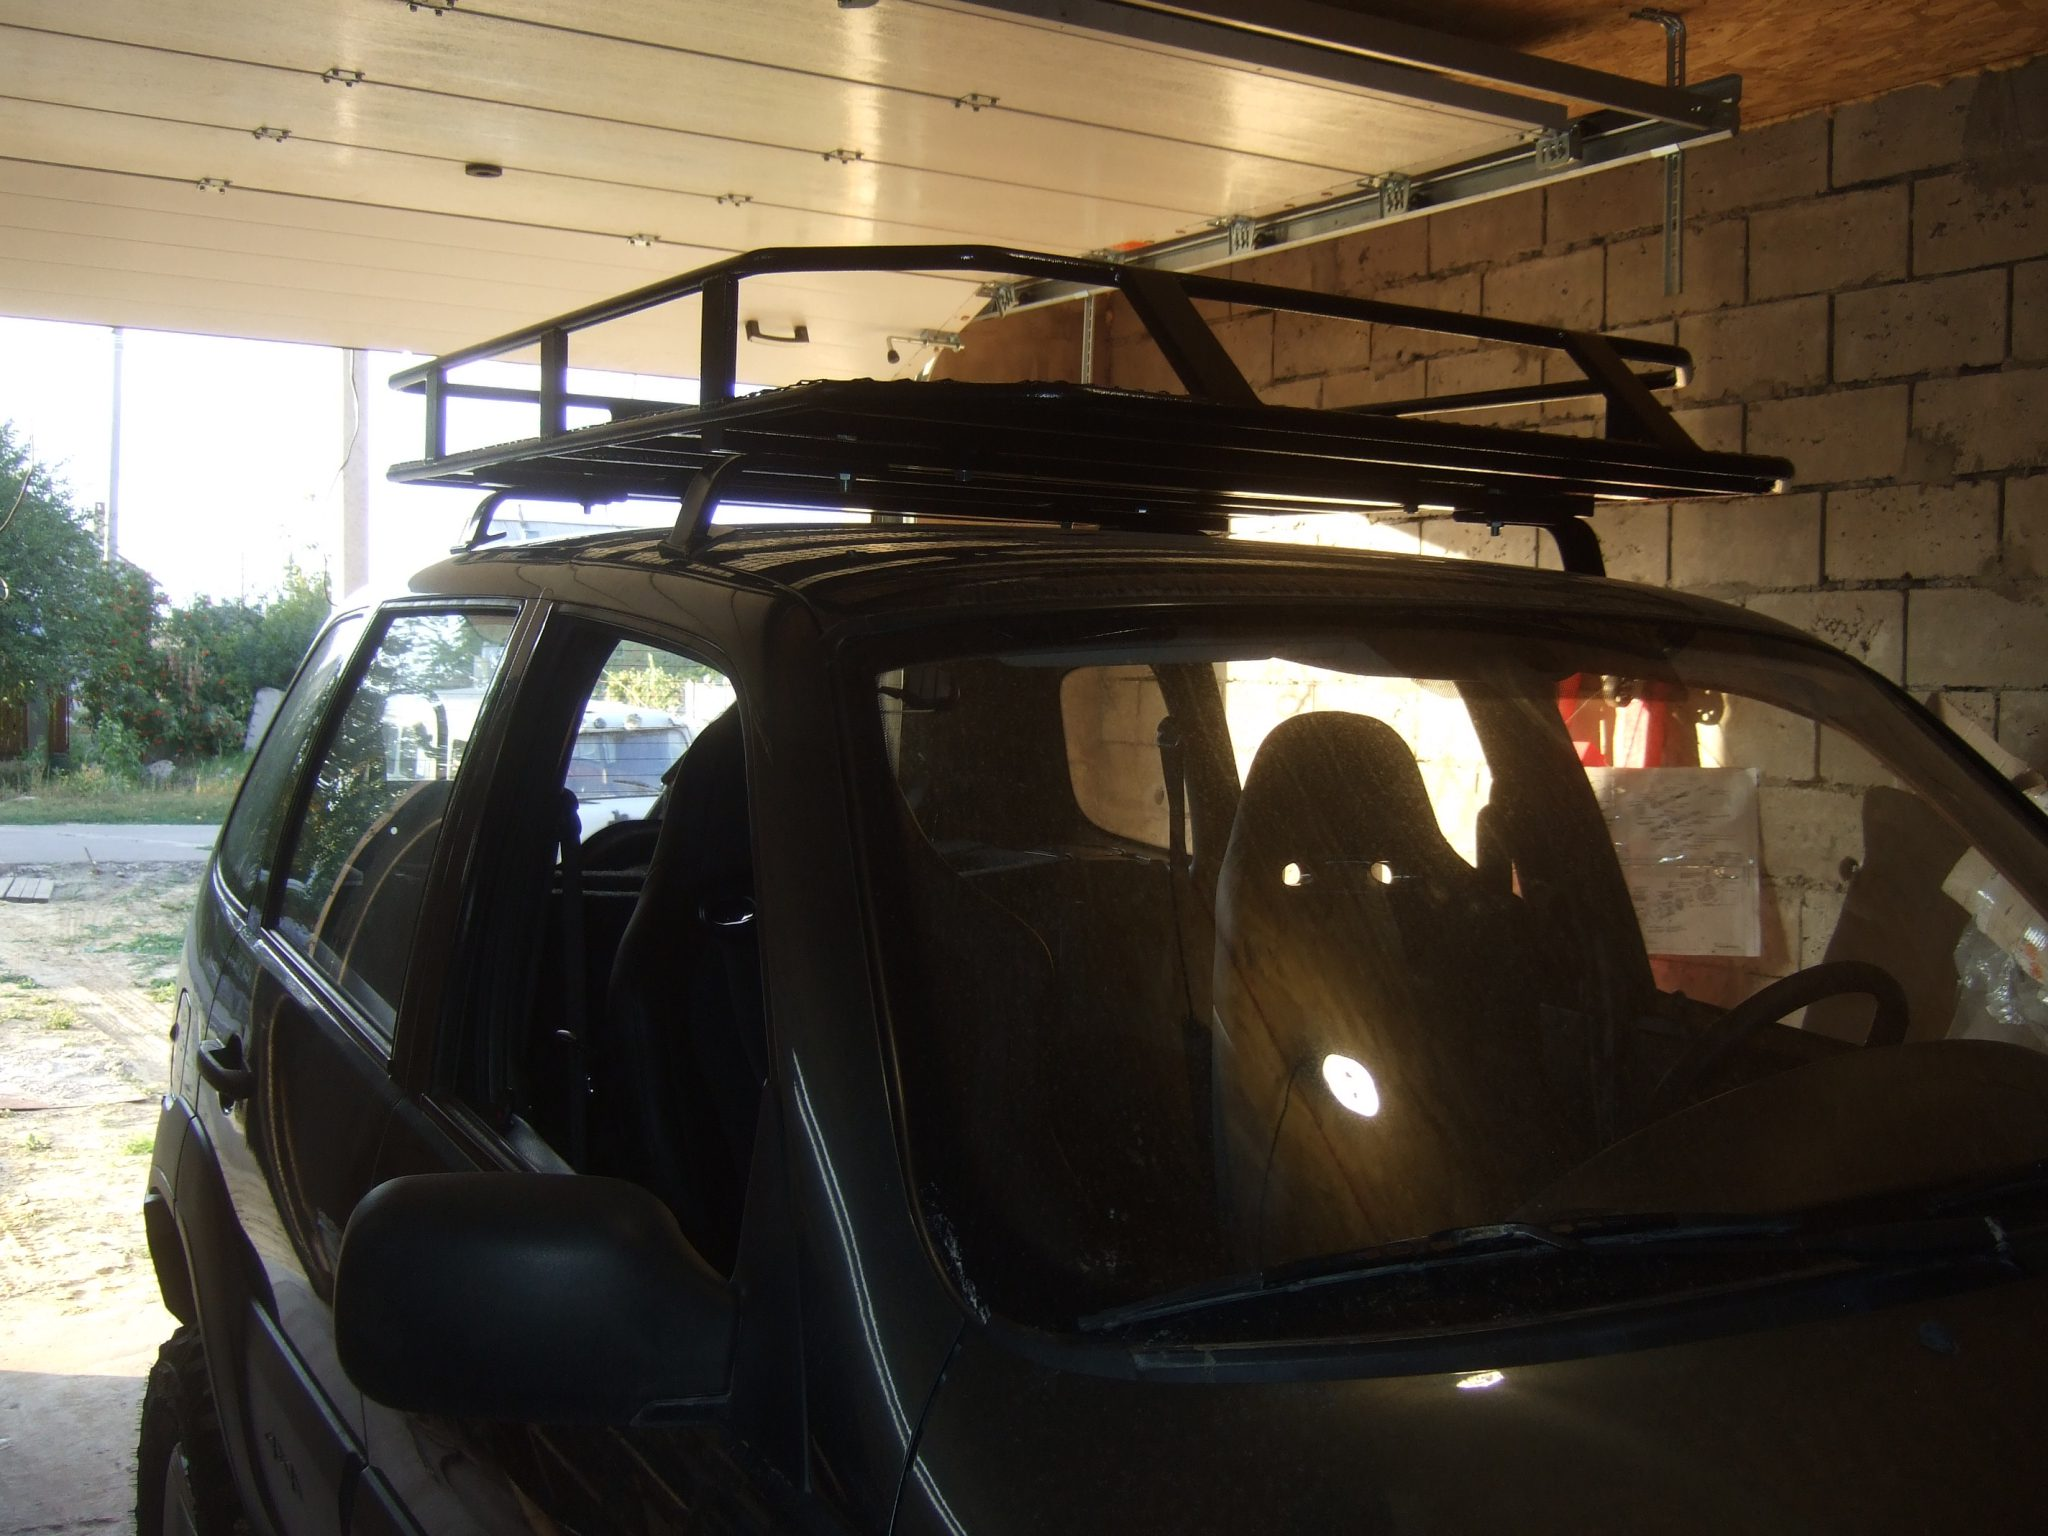 Багажник на автомобиль своими руками фото